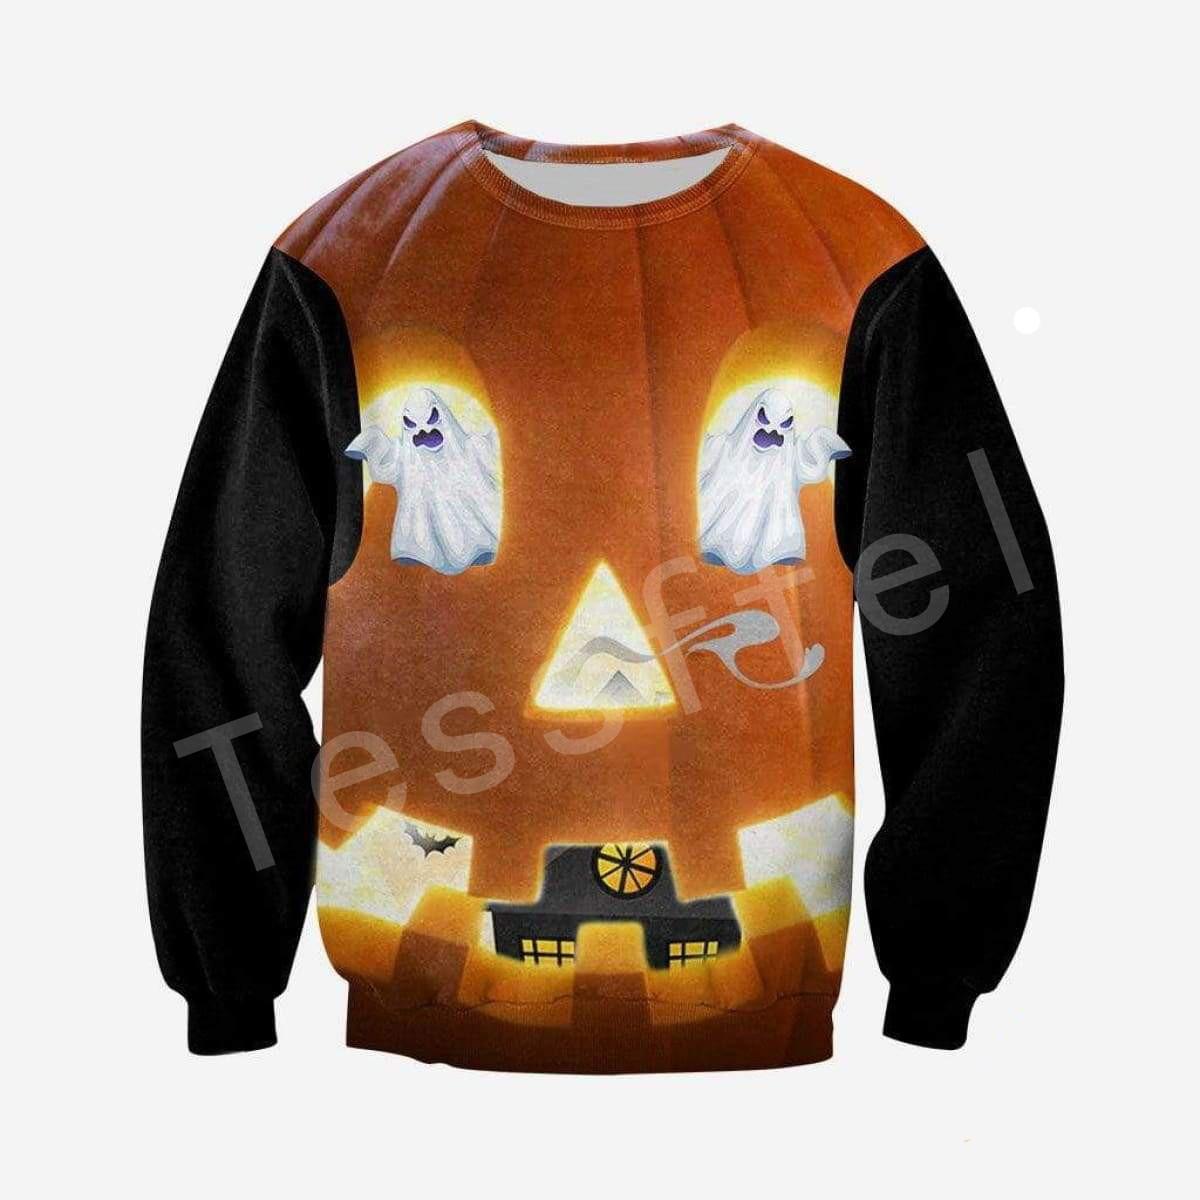 Tessffel Halloween Tracksuit MenWomen HipHop 3Dfull Printed Sweatshirts Hoodie shirts Jacket Casual colorful fit funny Style 10 in Hoodies amp Sweatshirts from Men 39 s Clothing